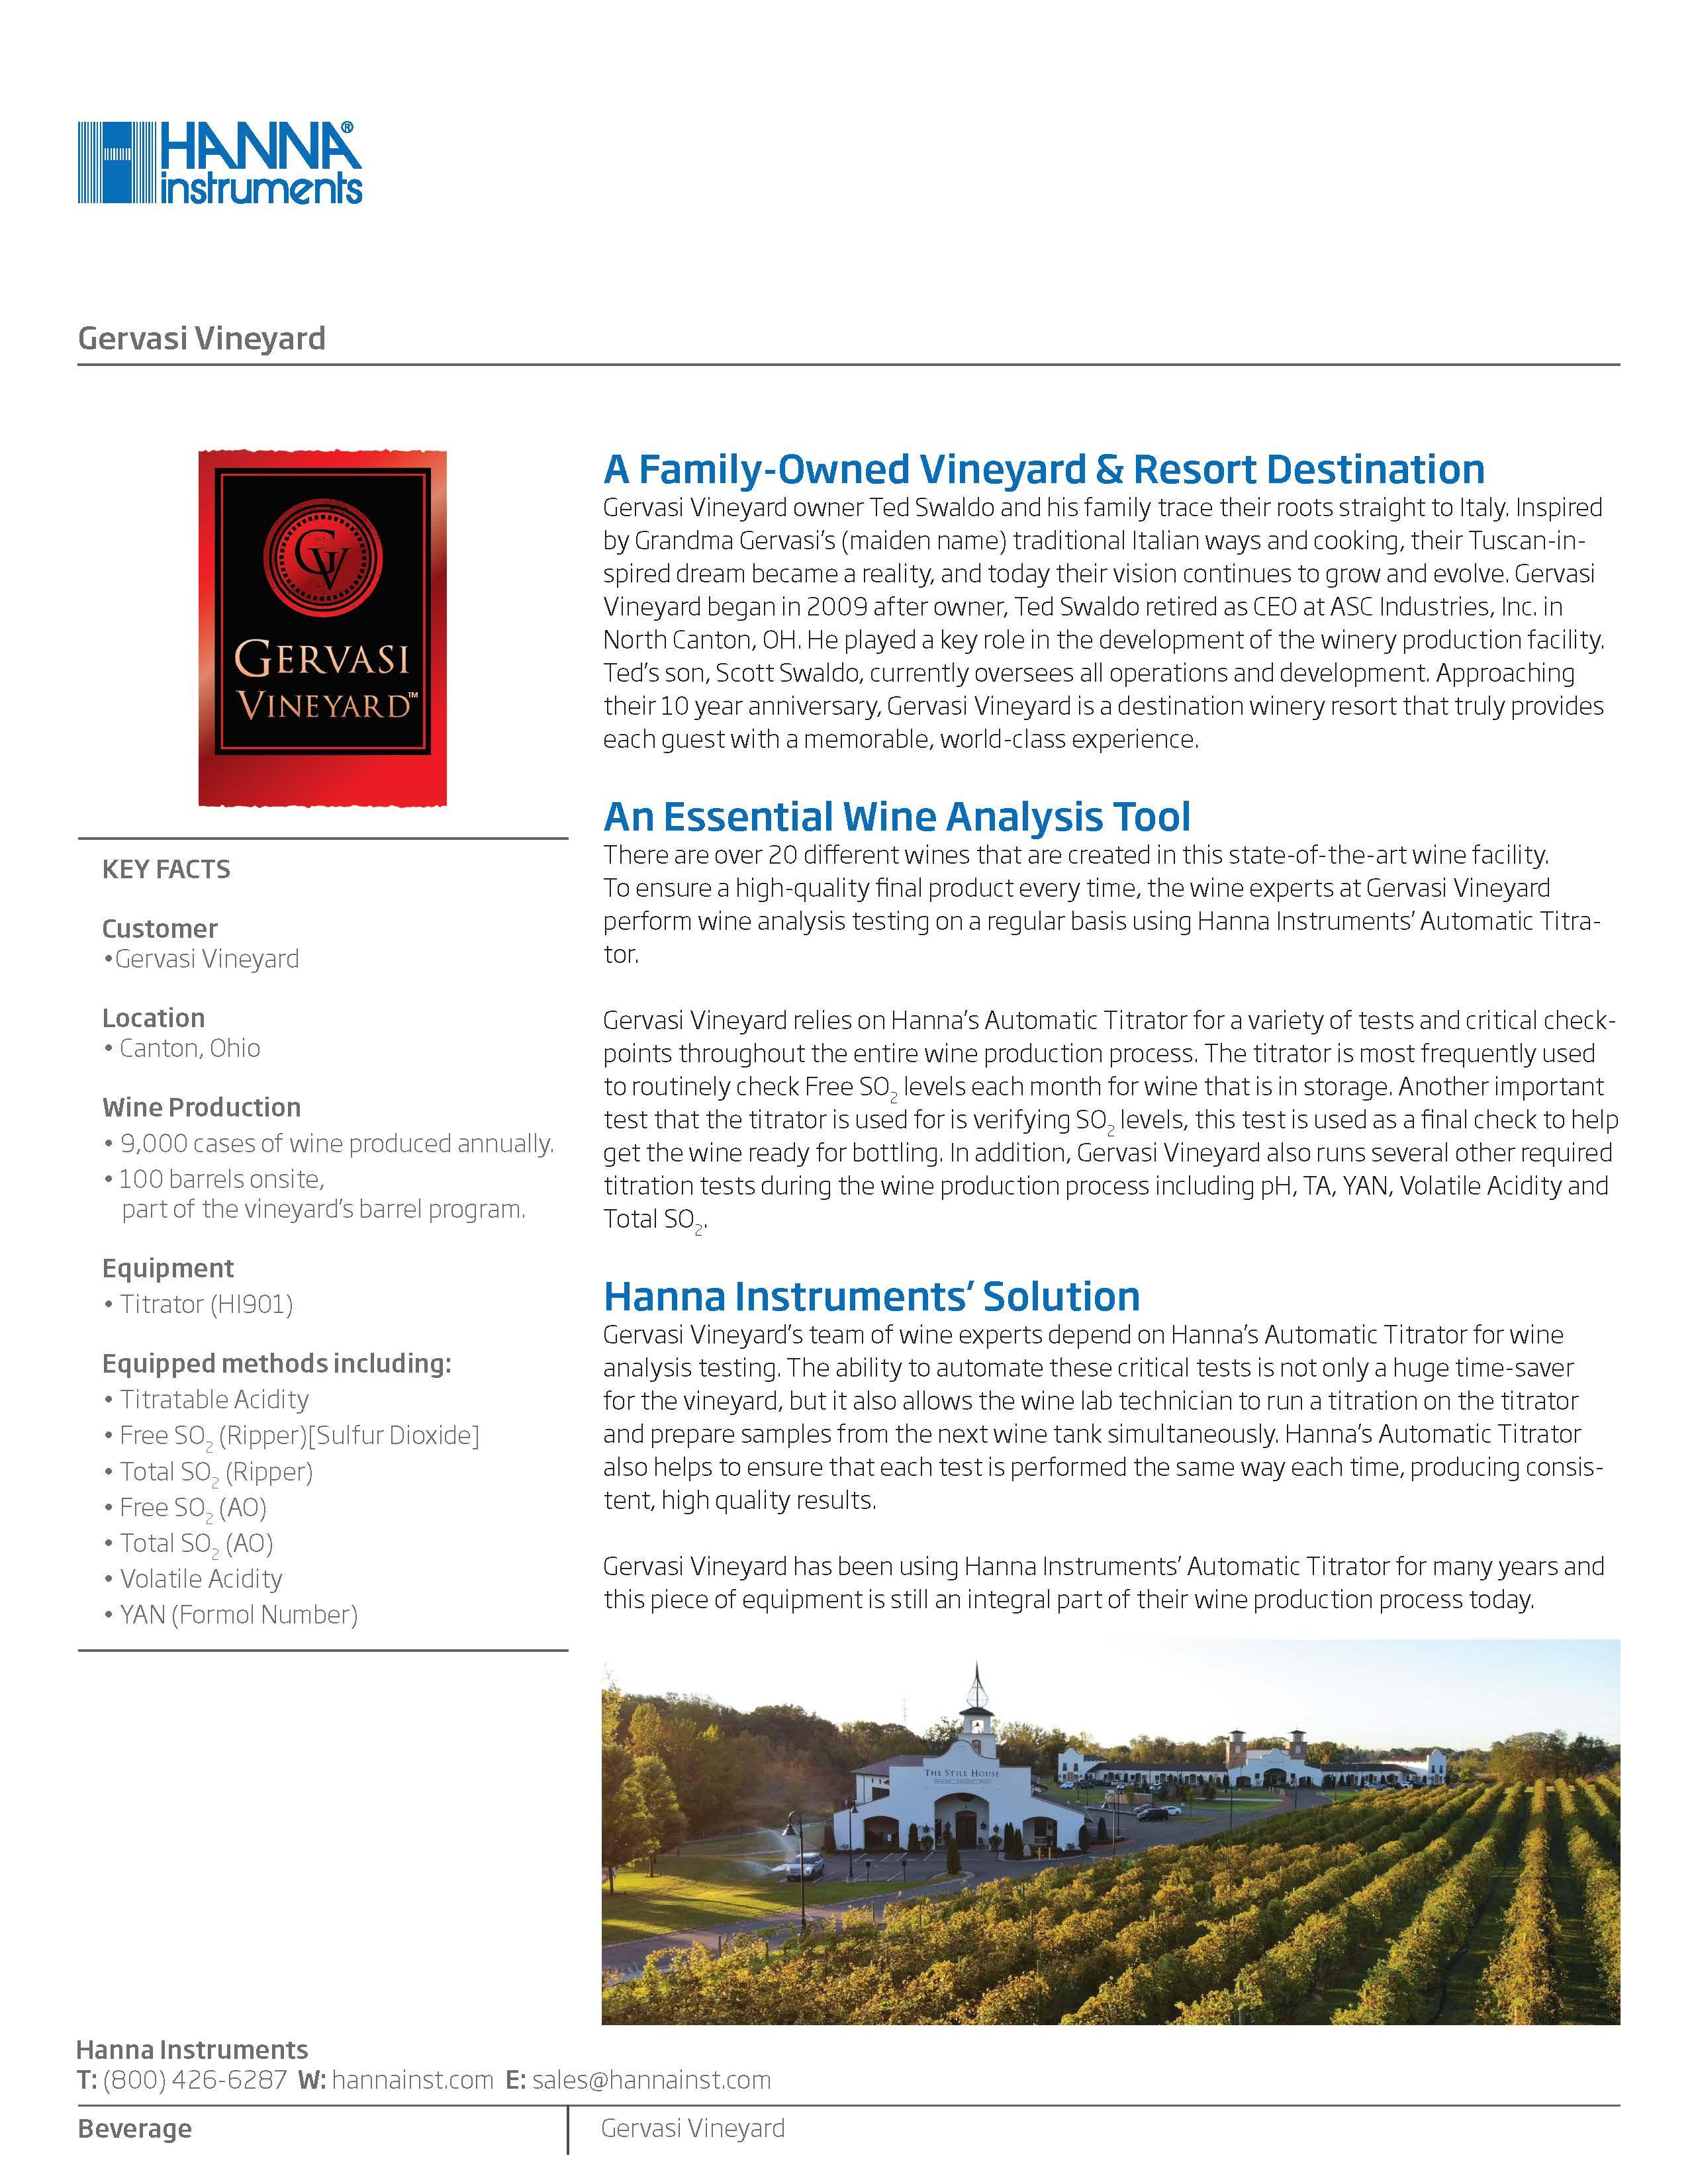 Gervasi-Vineyard-Customer-Spotlight